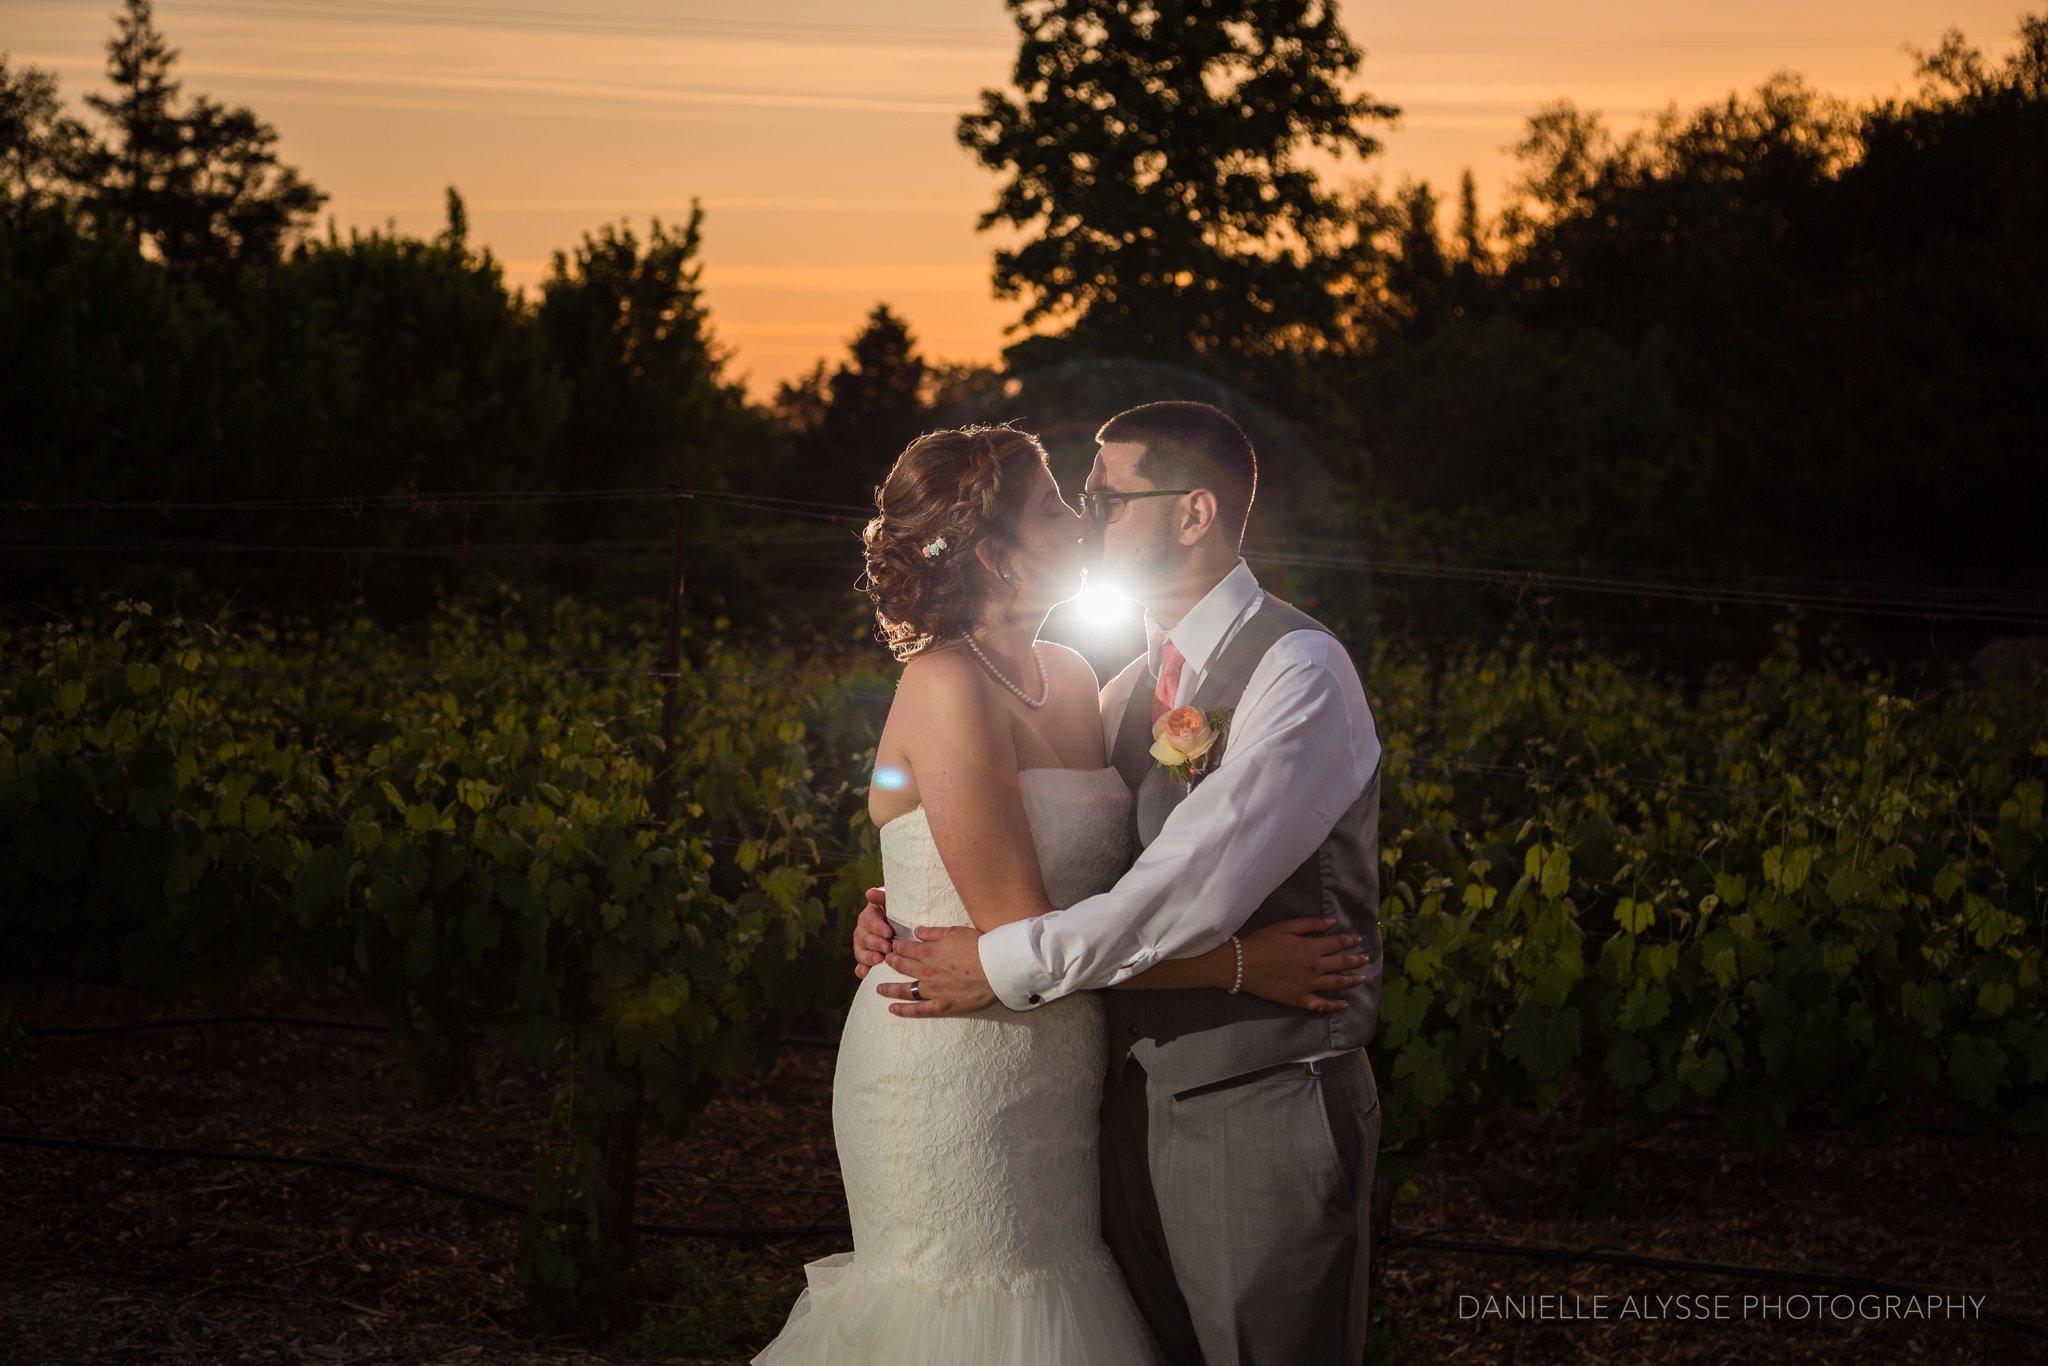 170507_blog_megan_david_wedding_loomis_flower_farm_inn_danielle_alysse_photography_sacramento_photographer0412_WEB.jpg